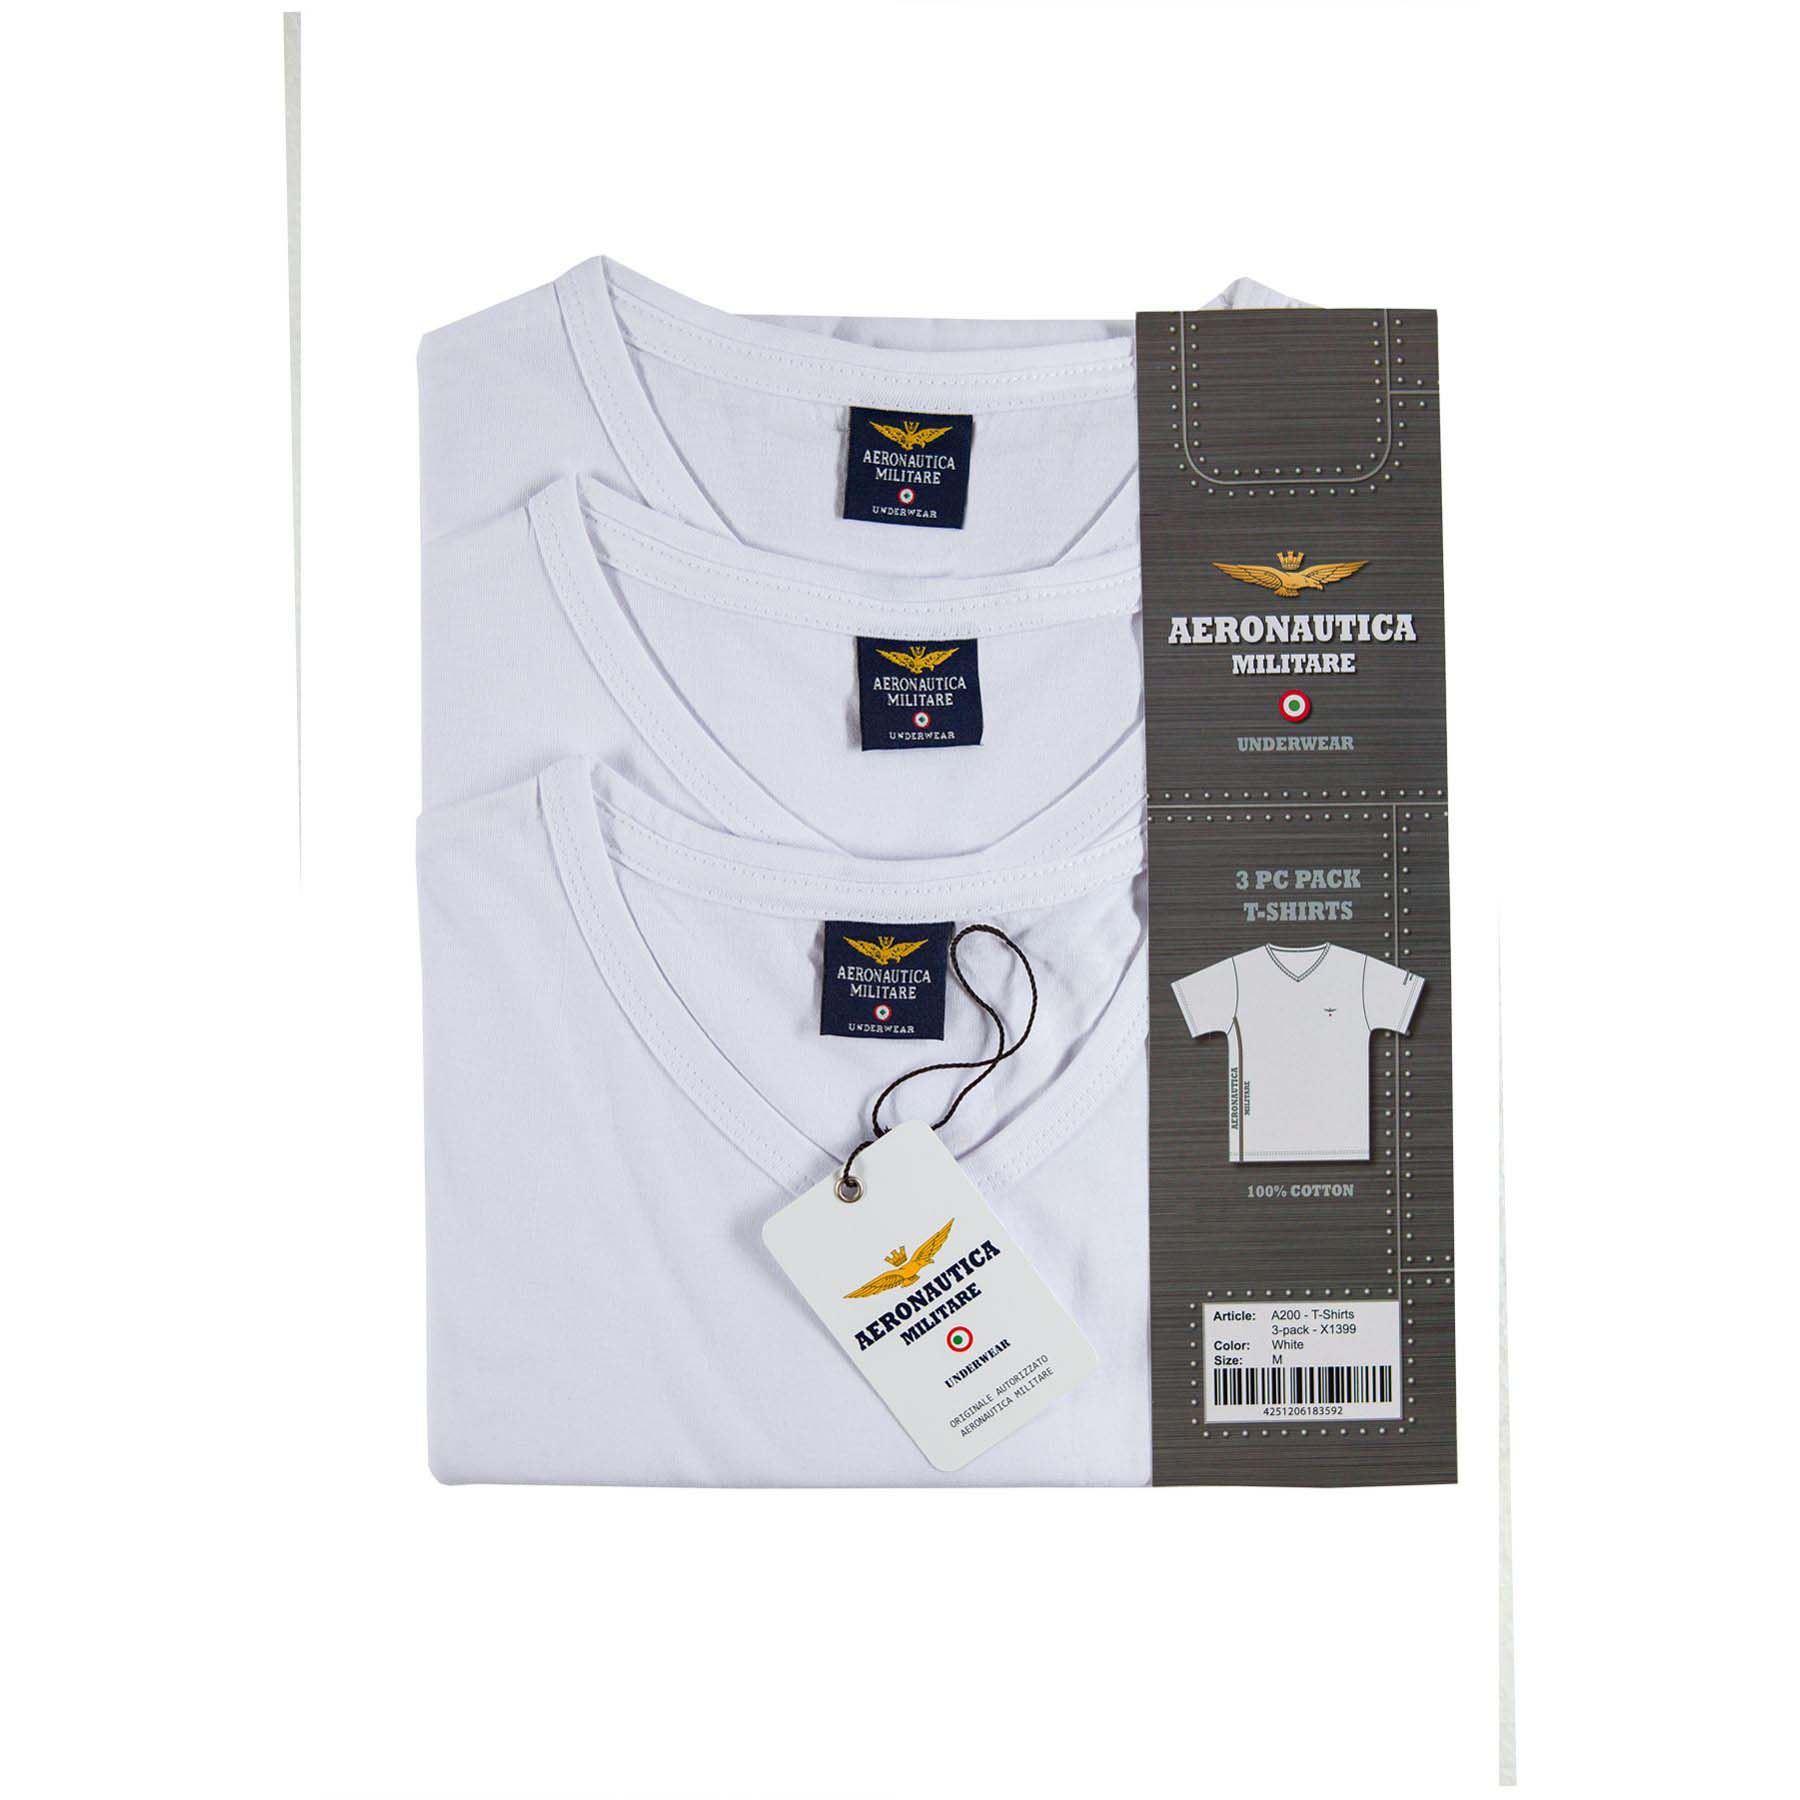 Aeronautica-Militare-3er-Pack-T-Shirts-100-Baumwolle